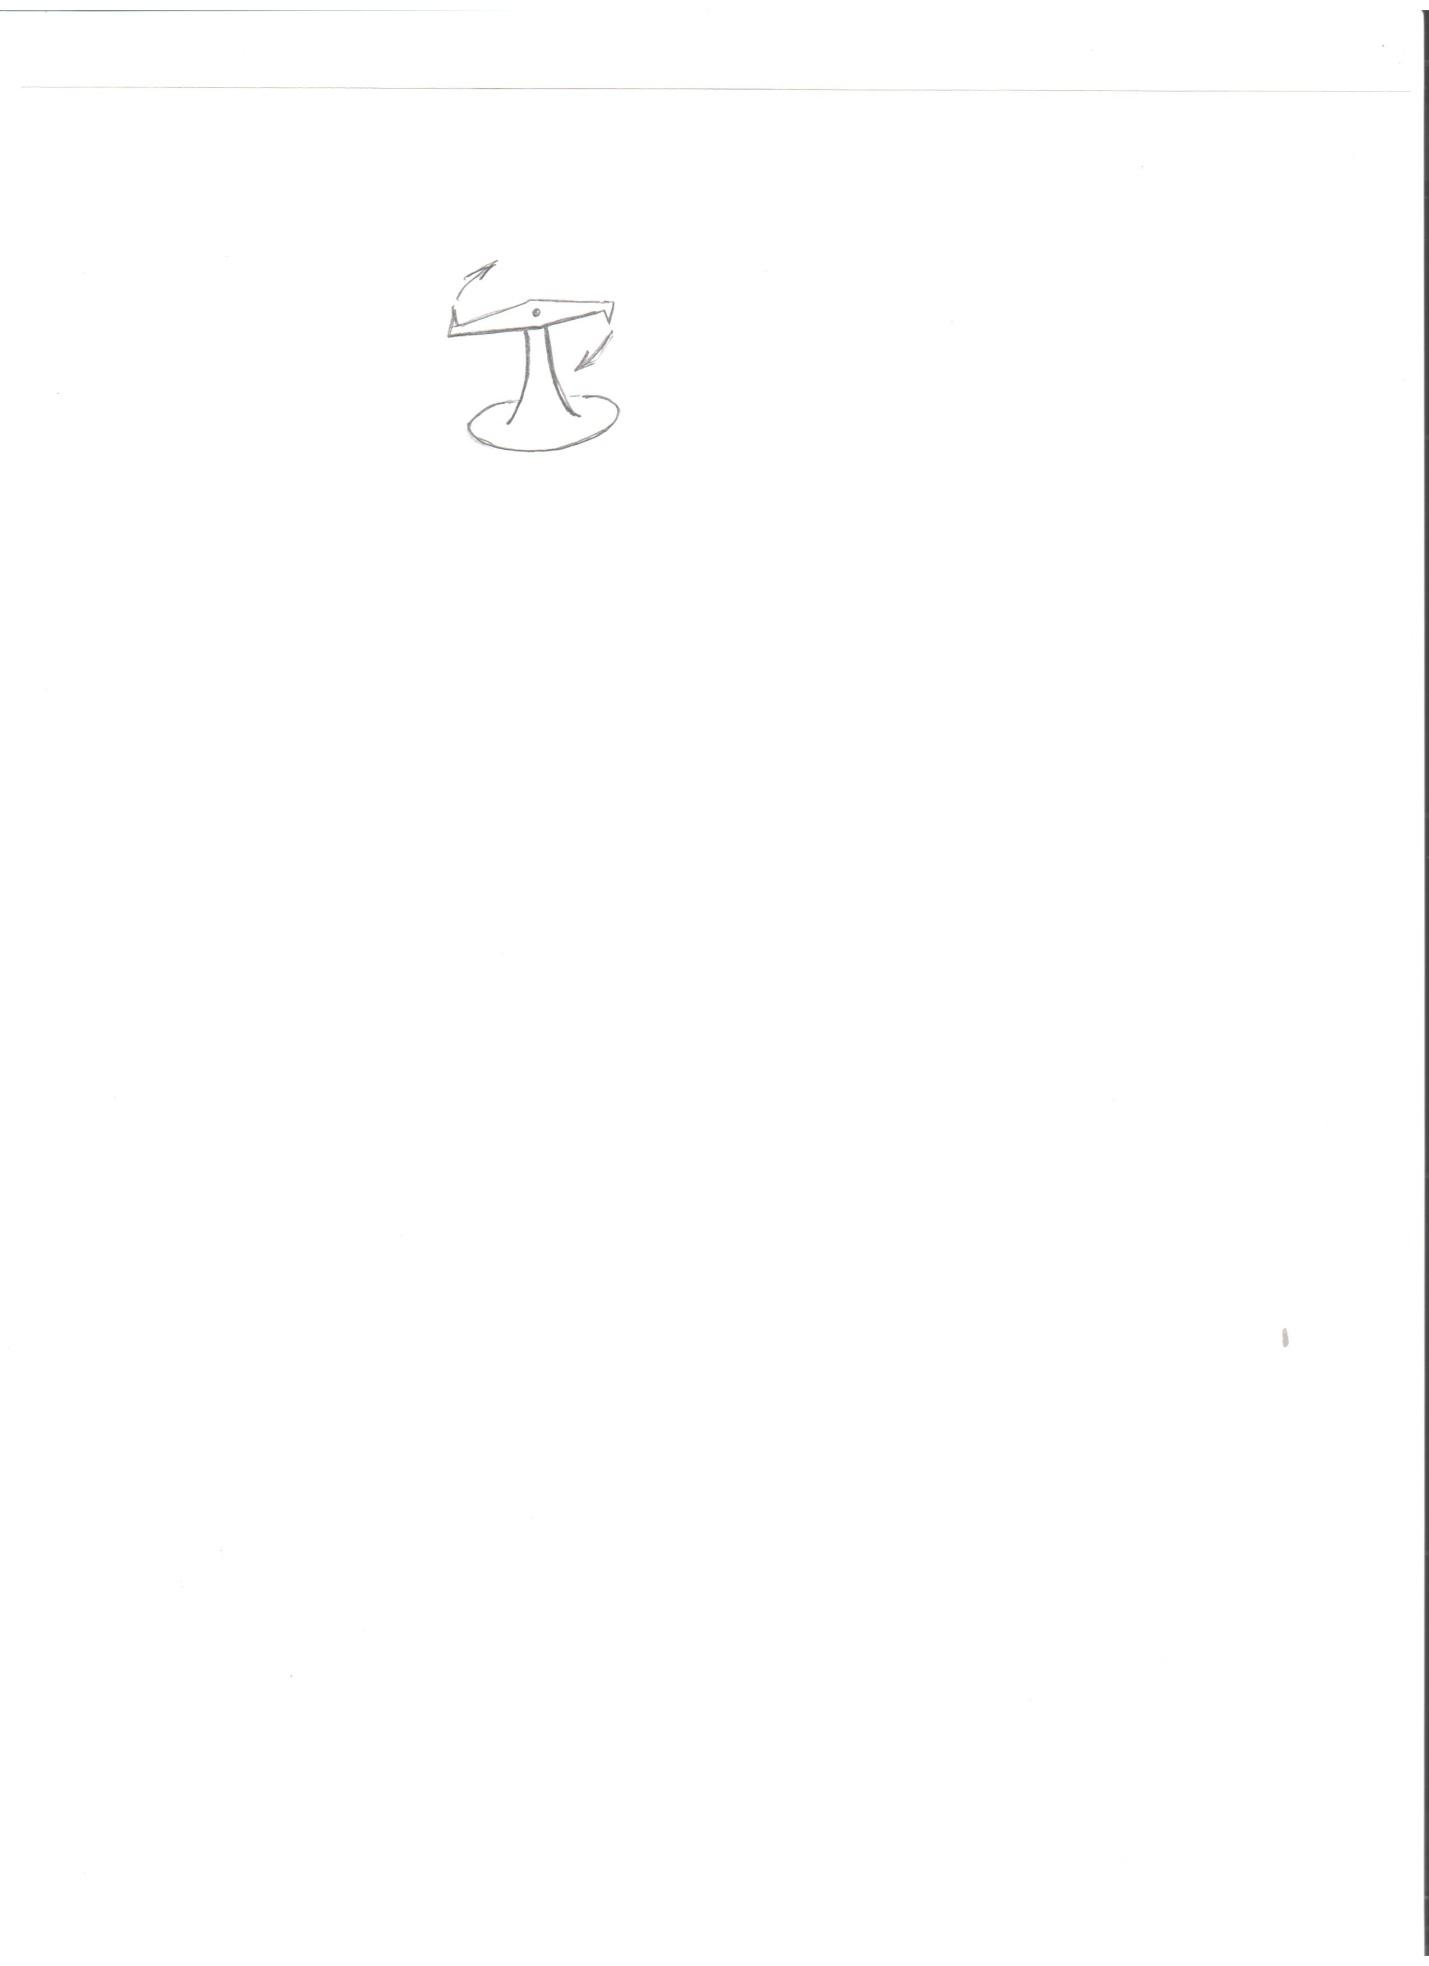 C:\Users\Неверова ЛП\Documents\Scanned Documents\Рисунок (138).jpg